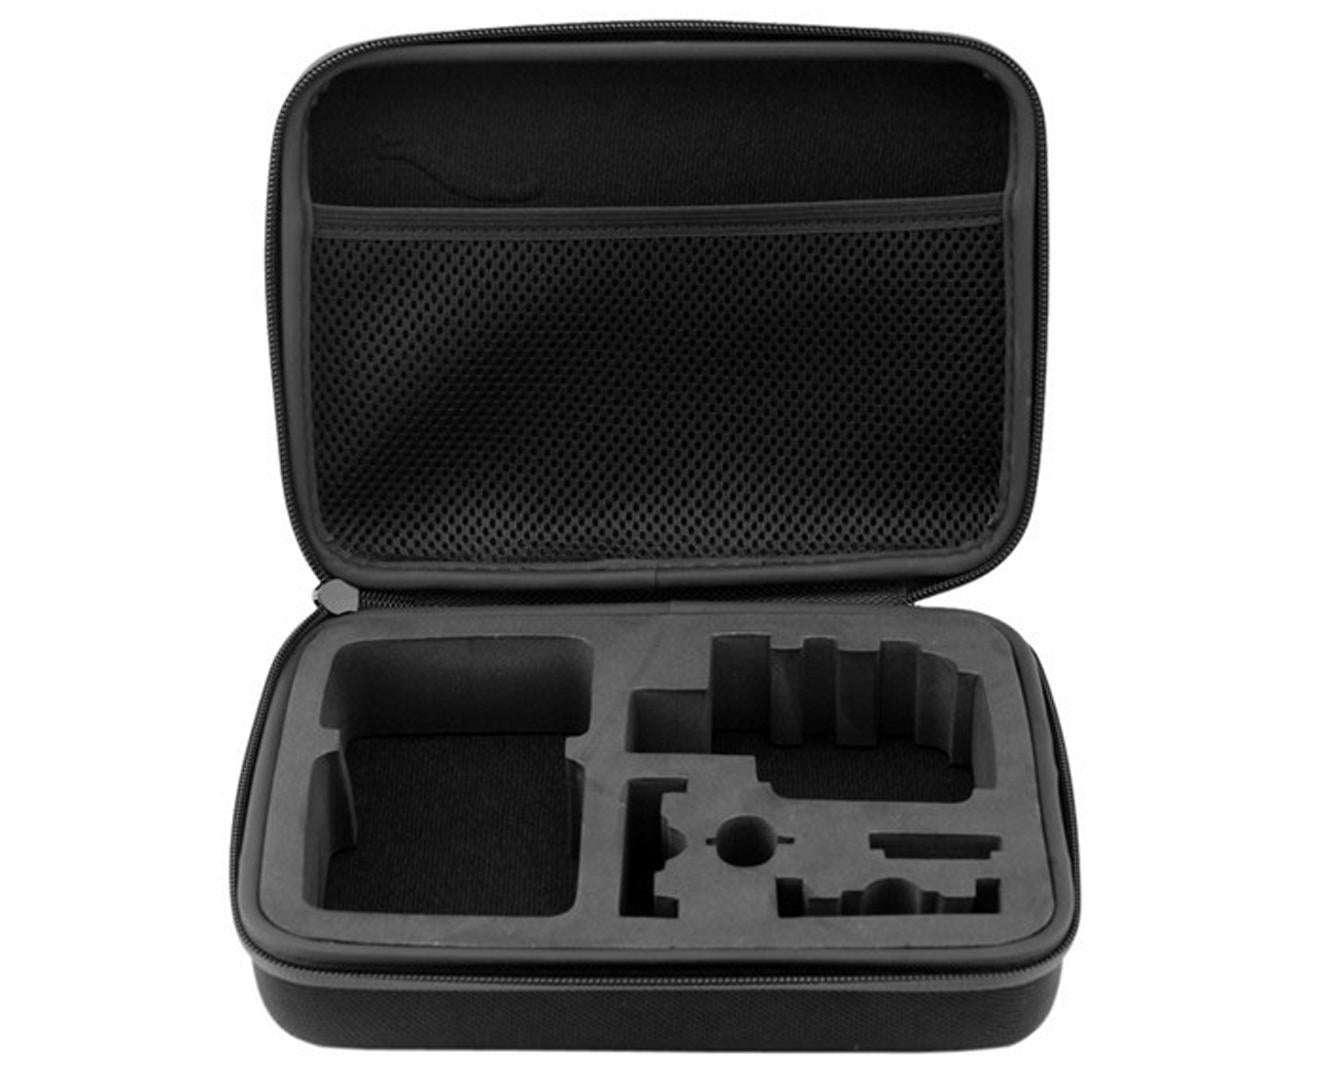 1080P Full Hd Sports Camera 30M Waterproof Loop Rec A9 Action Camera W/ Case - Yellow